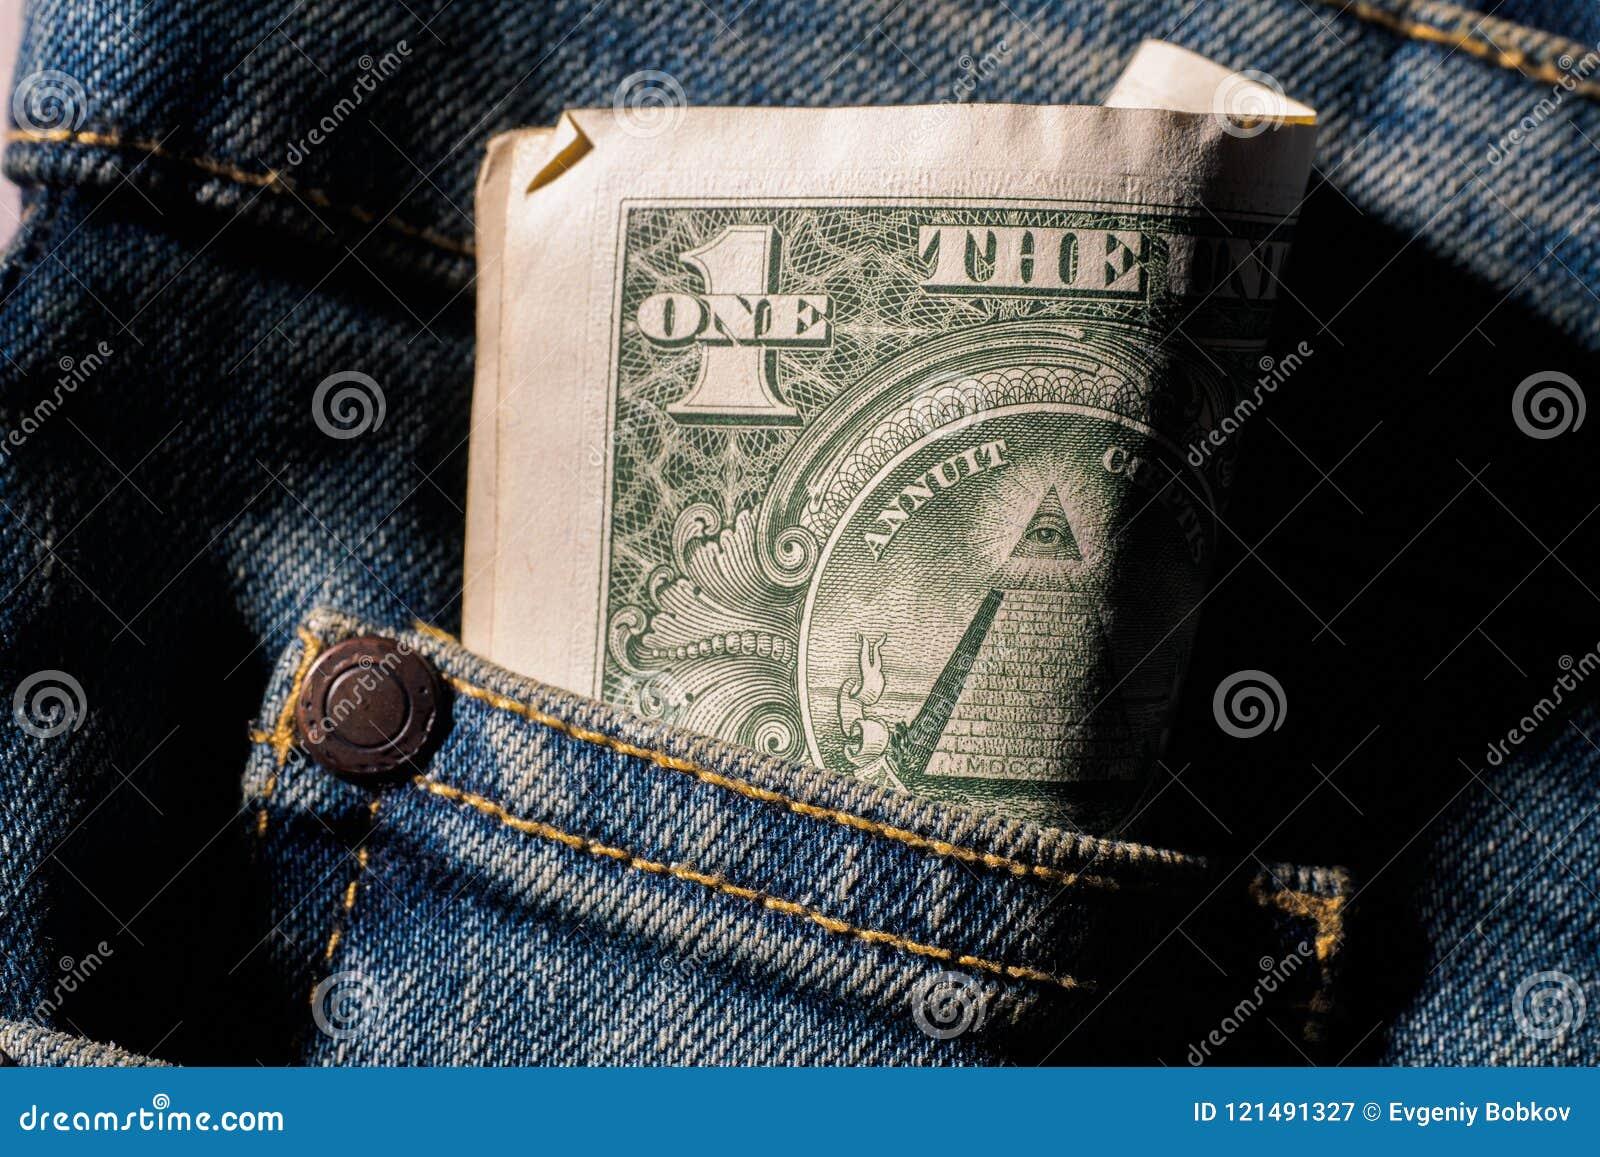 Novus Ordo Seclorum One Dollar Us Symbolism Pyramid And All